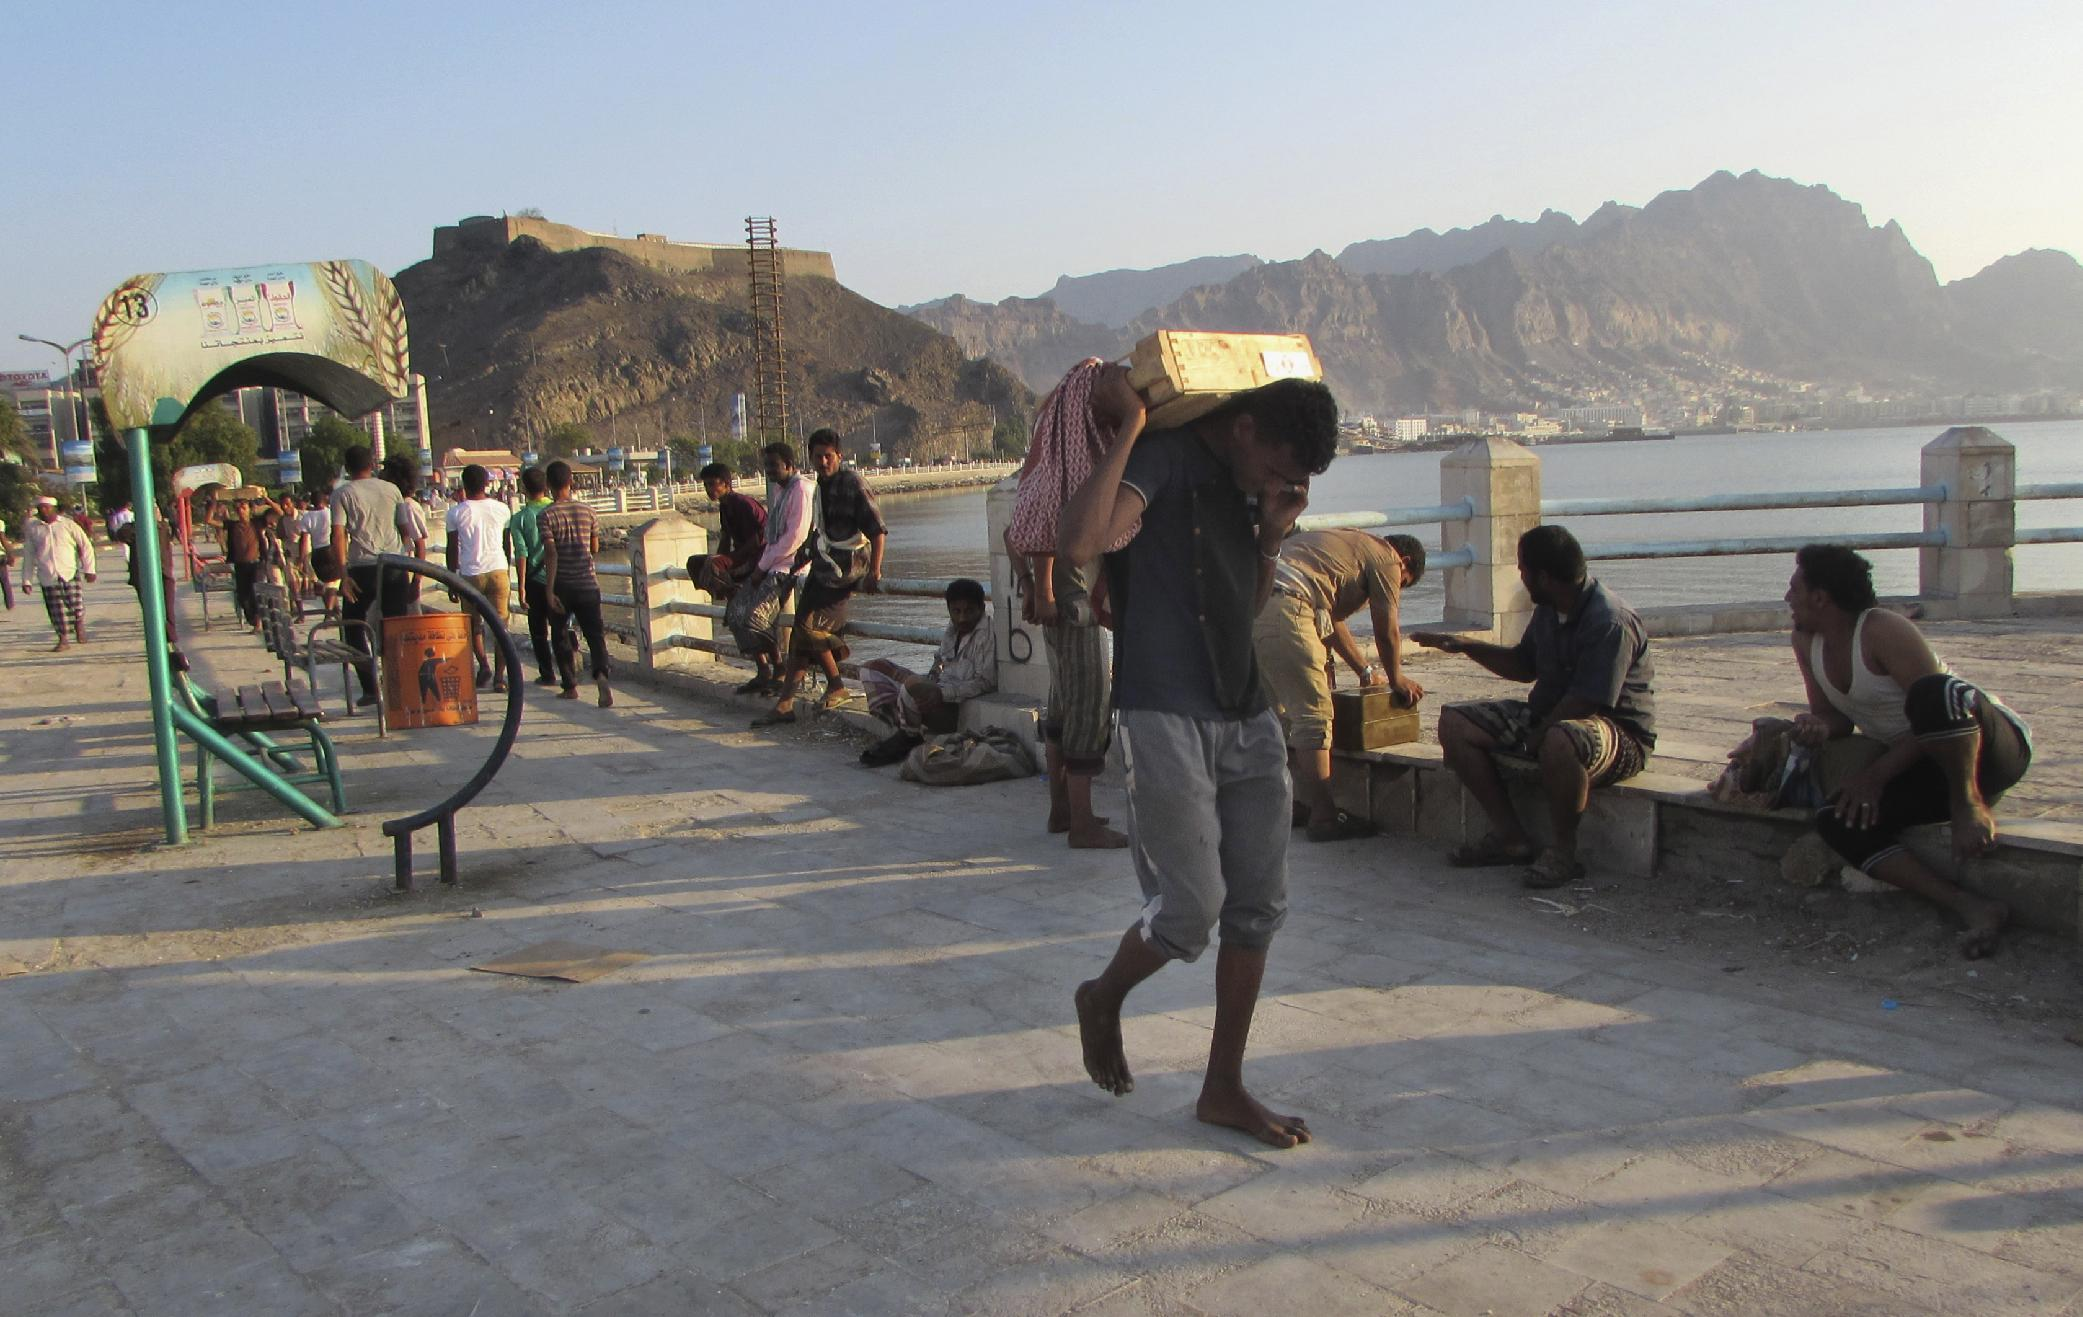 Yemen's president calls Shiite rebels 'puppets of Iran'